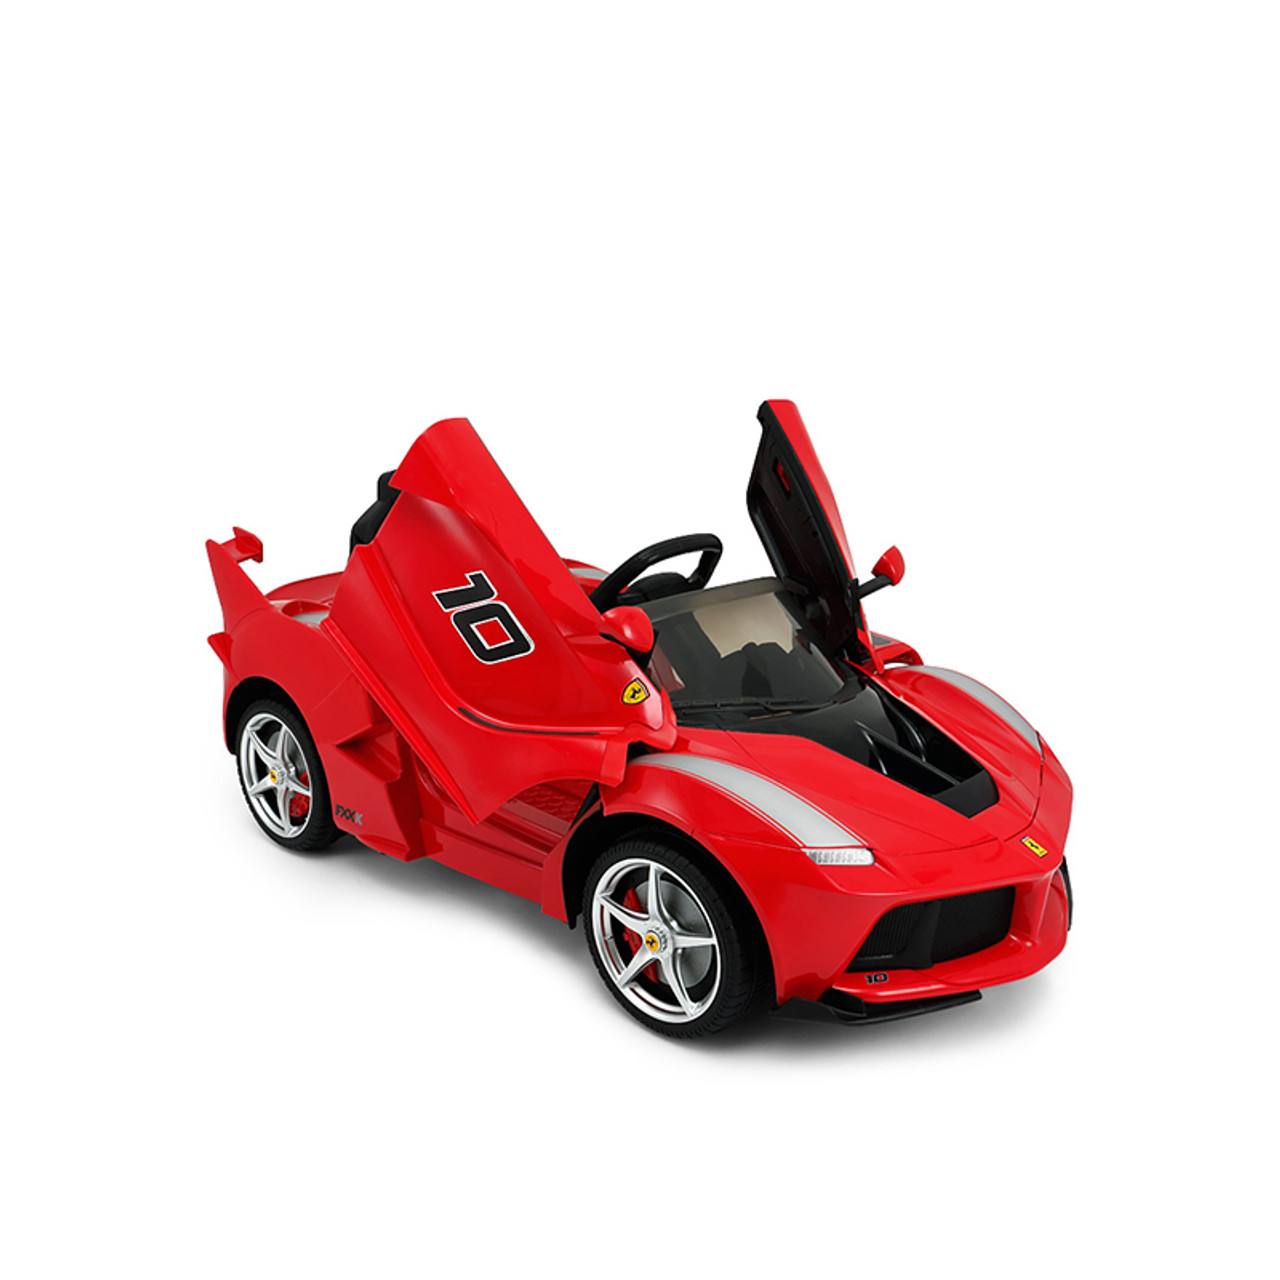 Rastar Licensed Ferrari Laferrari 2 4g Ride On Car Joy Baby